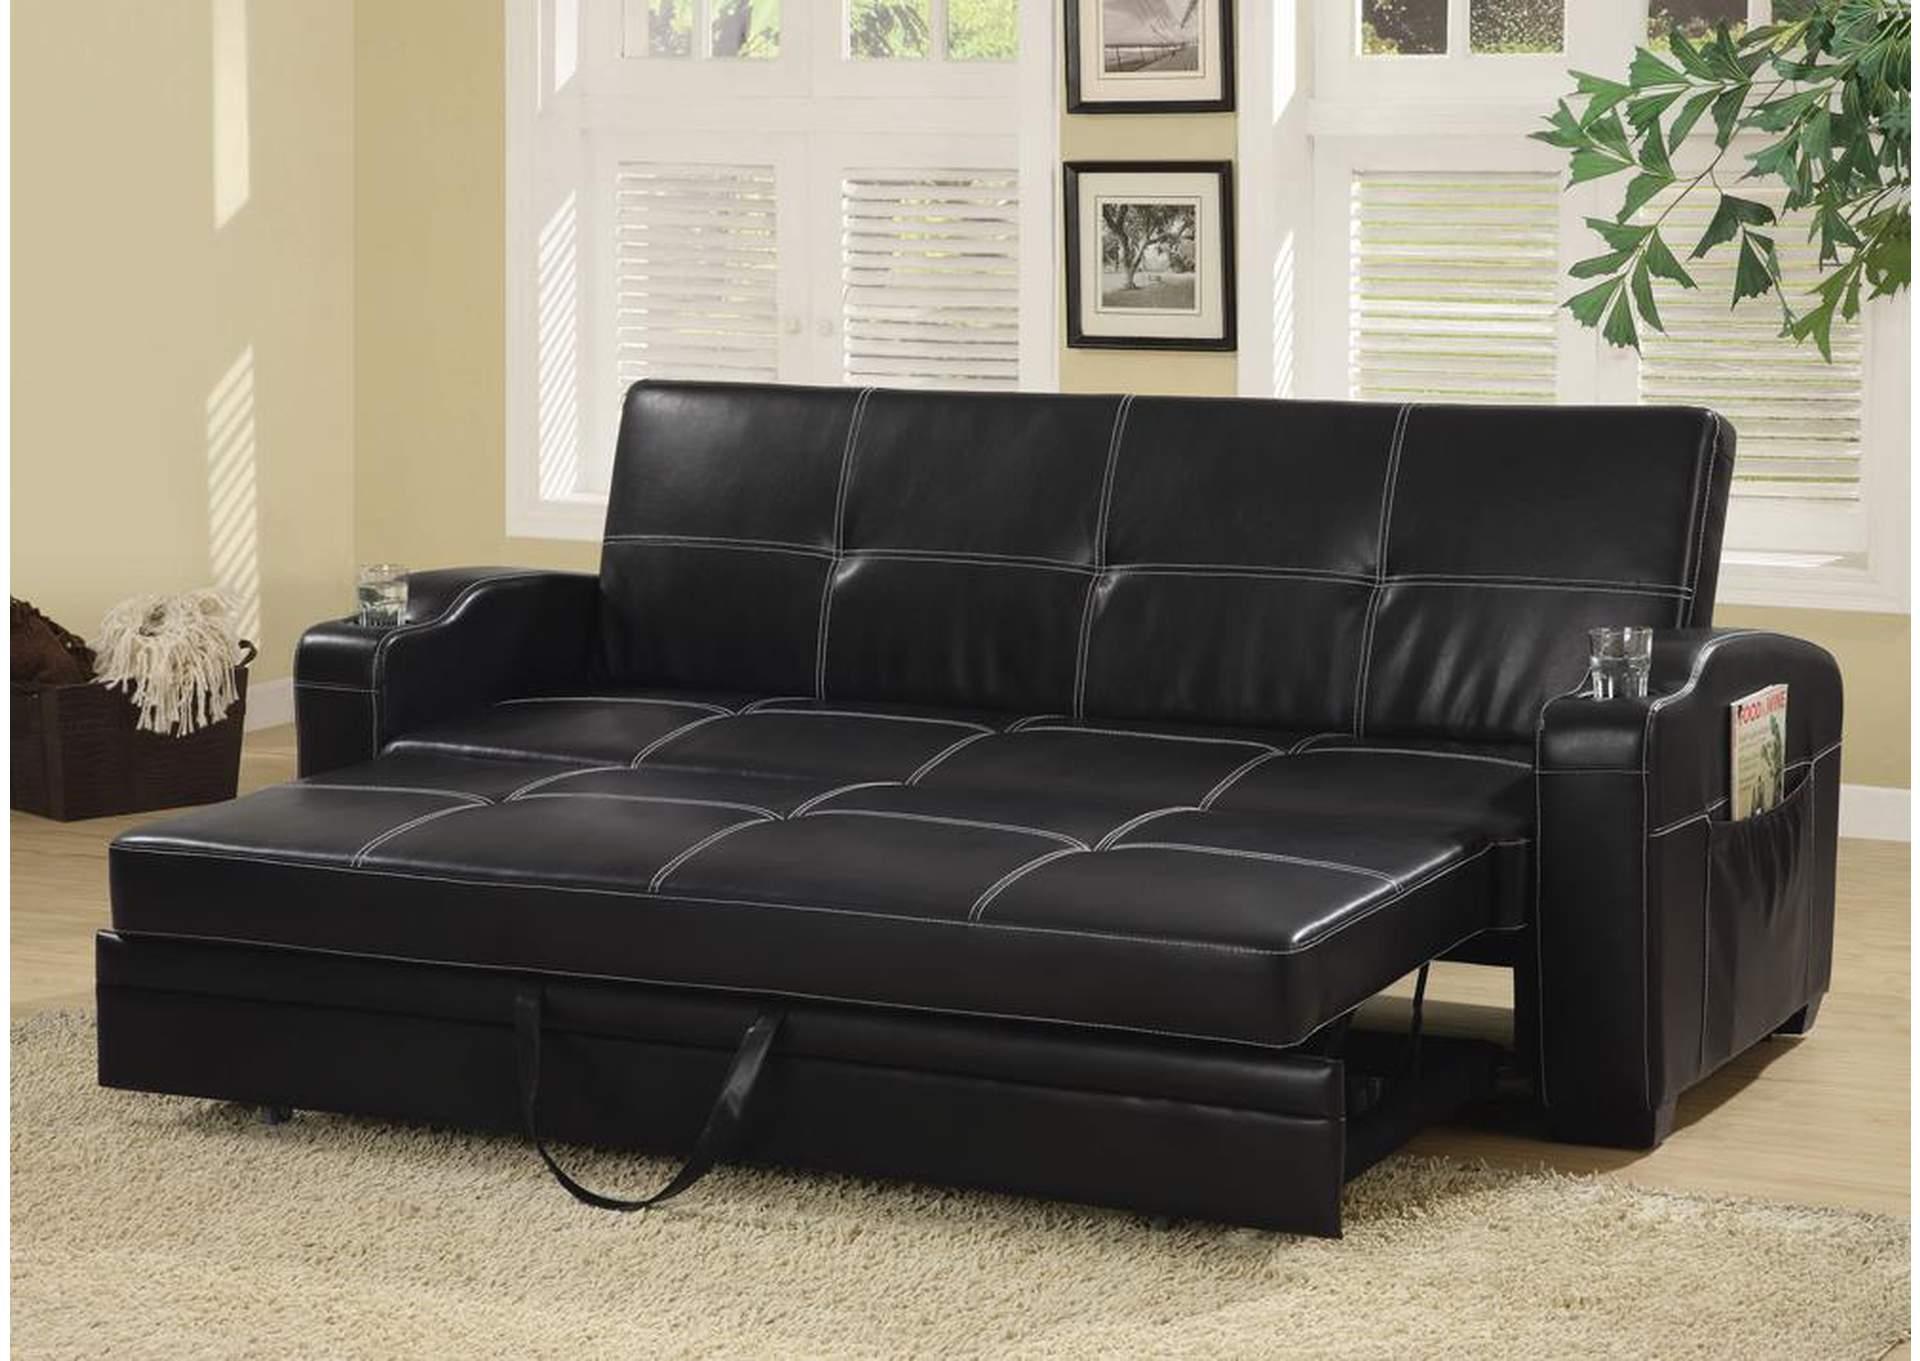 Direct Buy Furniture | Philadelphia, PA Black Sofa Bed